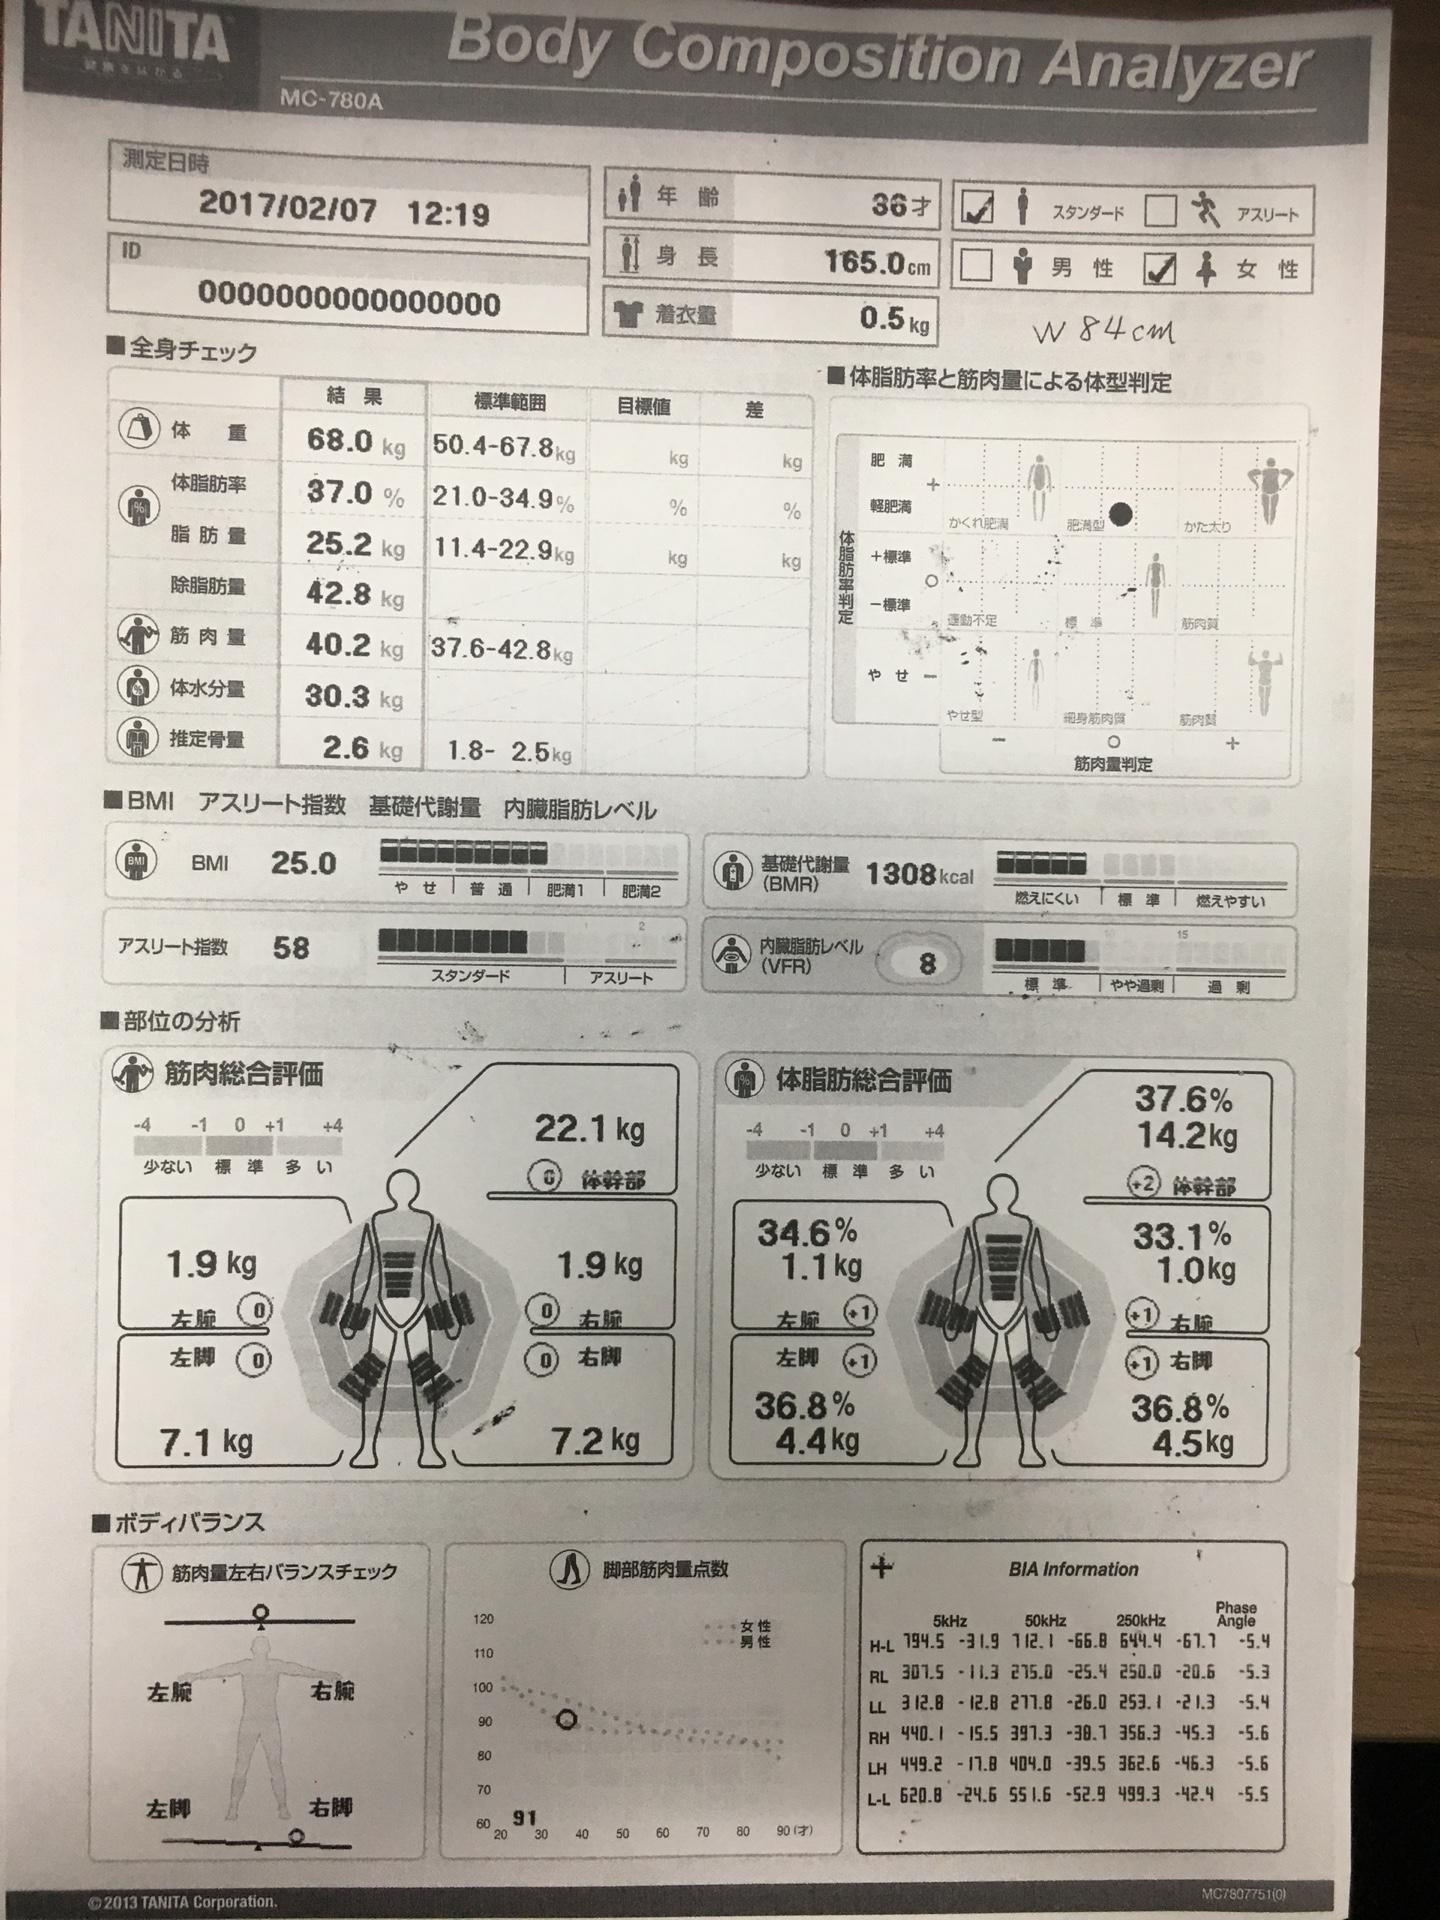 IMG_7248-19-03-18-13-11.JPG